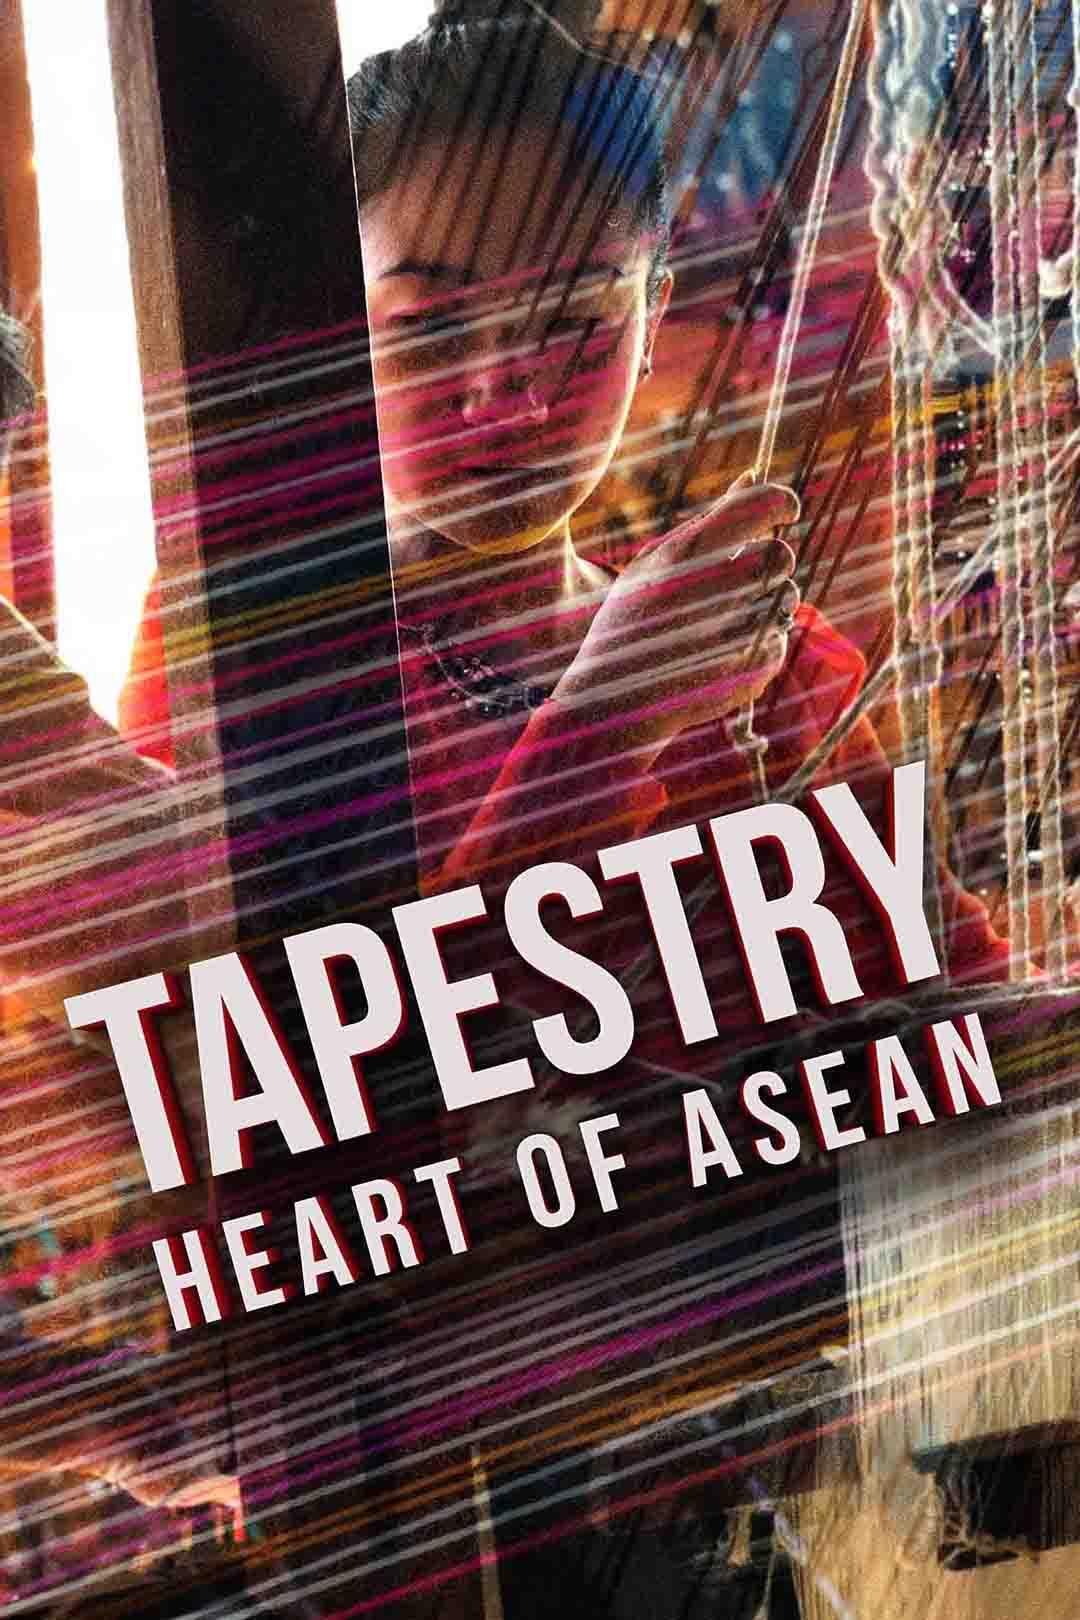 Tapestry: Heart of ASEAN